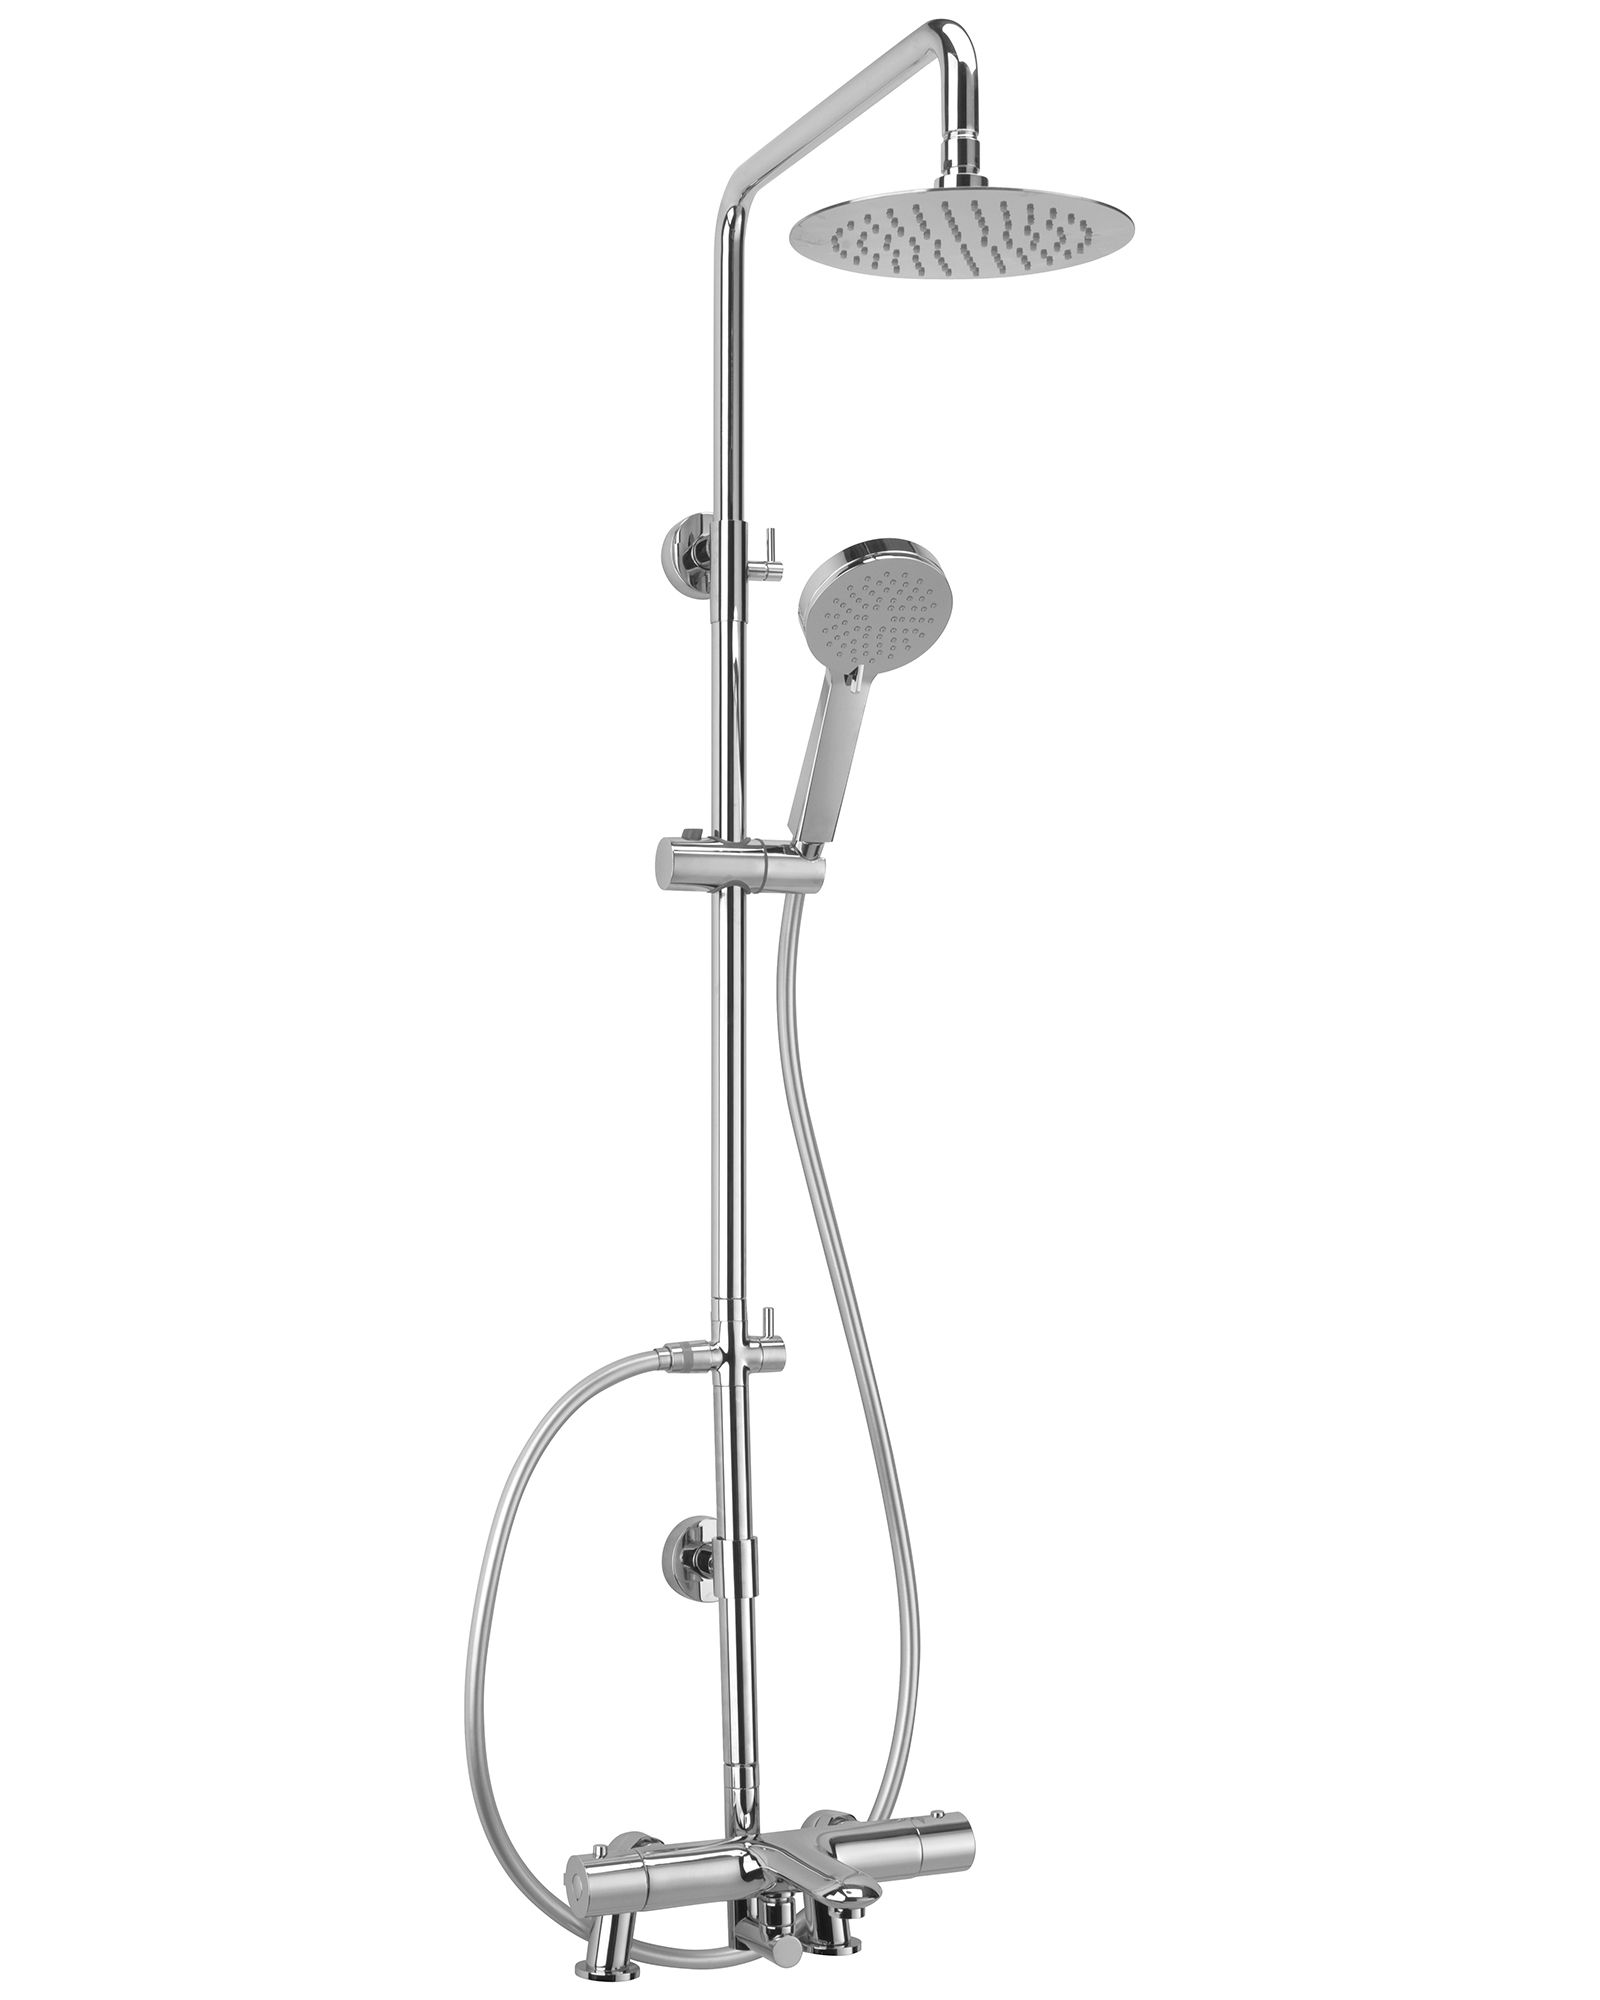 Sagittarius Logic Deck Mounted Bath Shower Mixer And Rigid Riser Kit